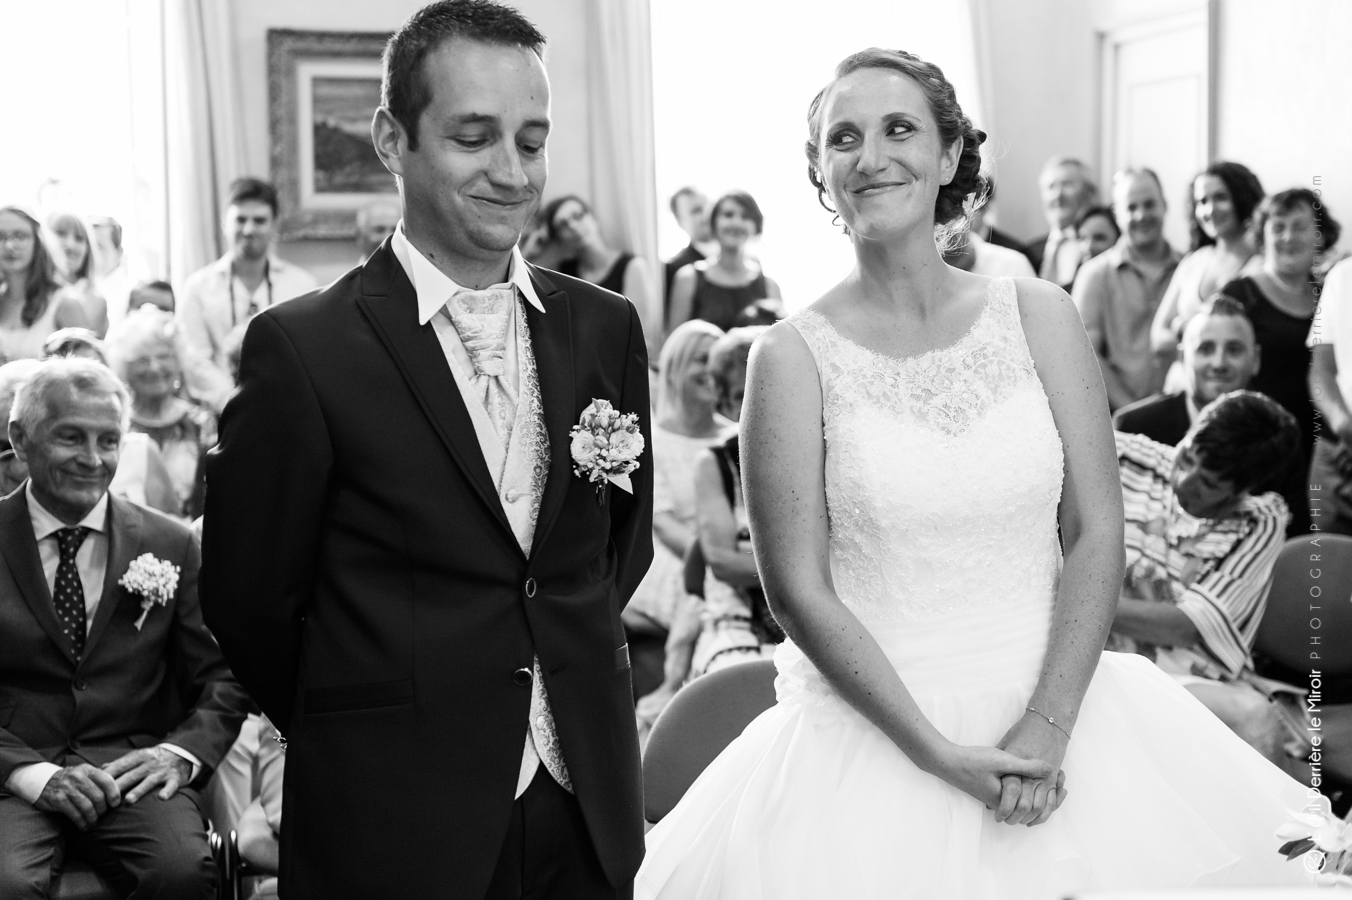 mariage-cj-vaugrenier-loeilderrierelemiroir-029